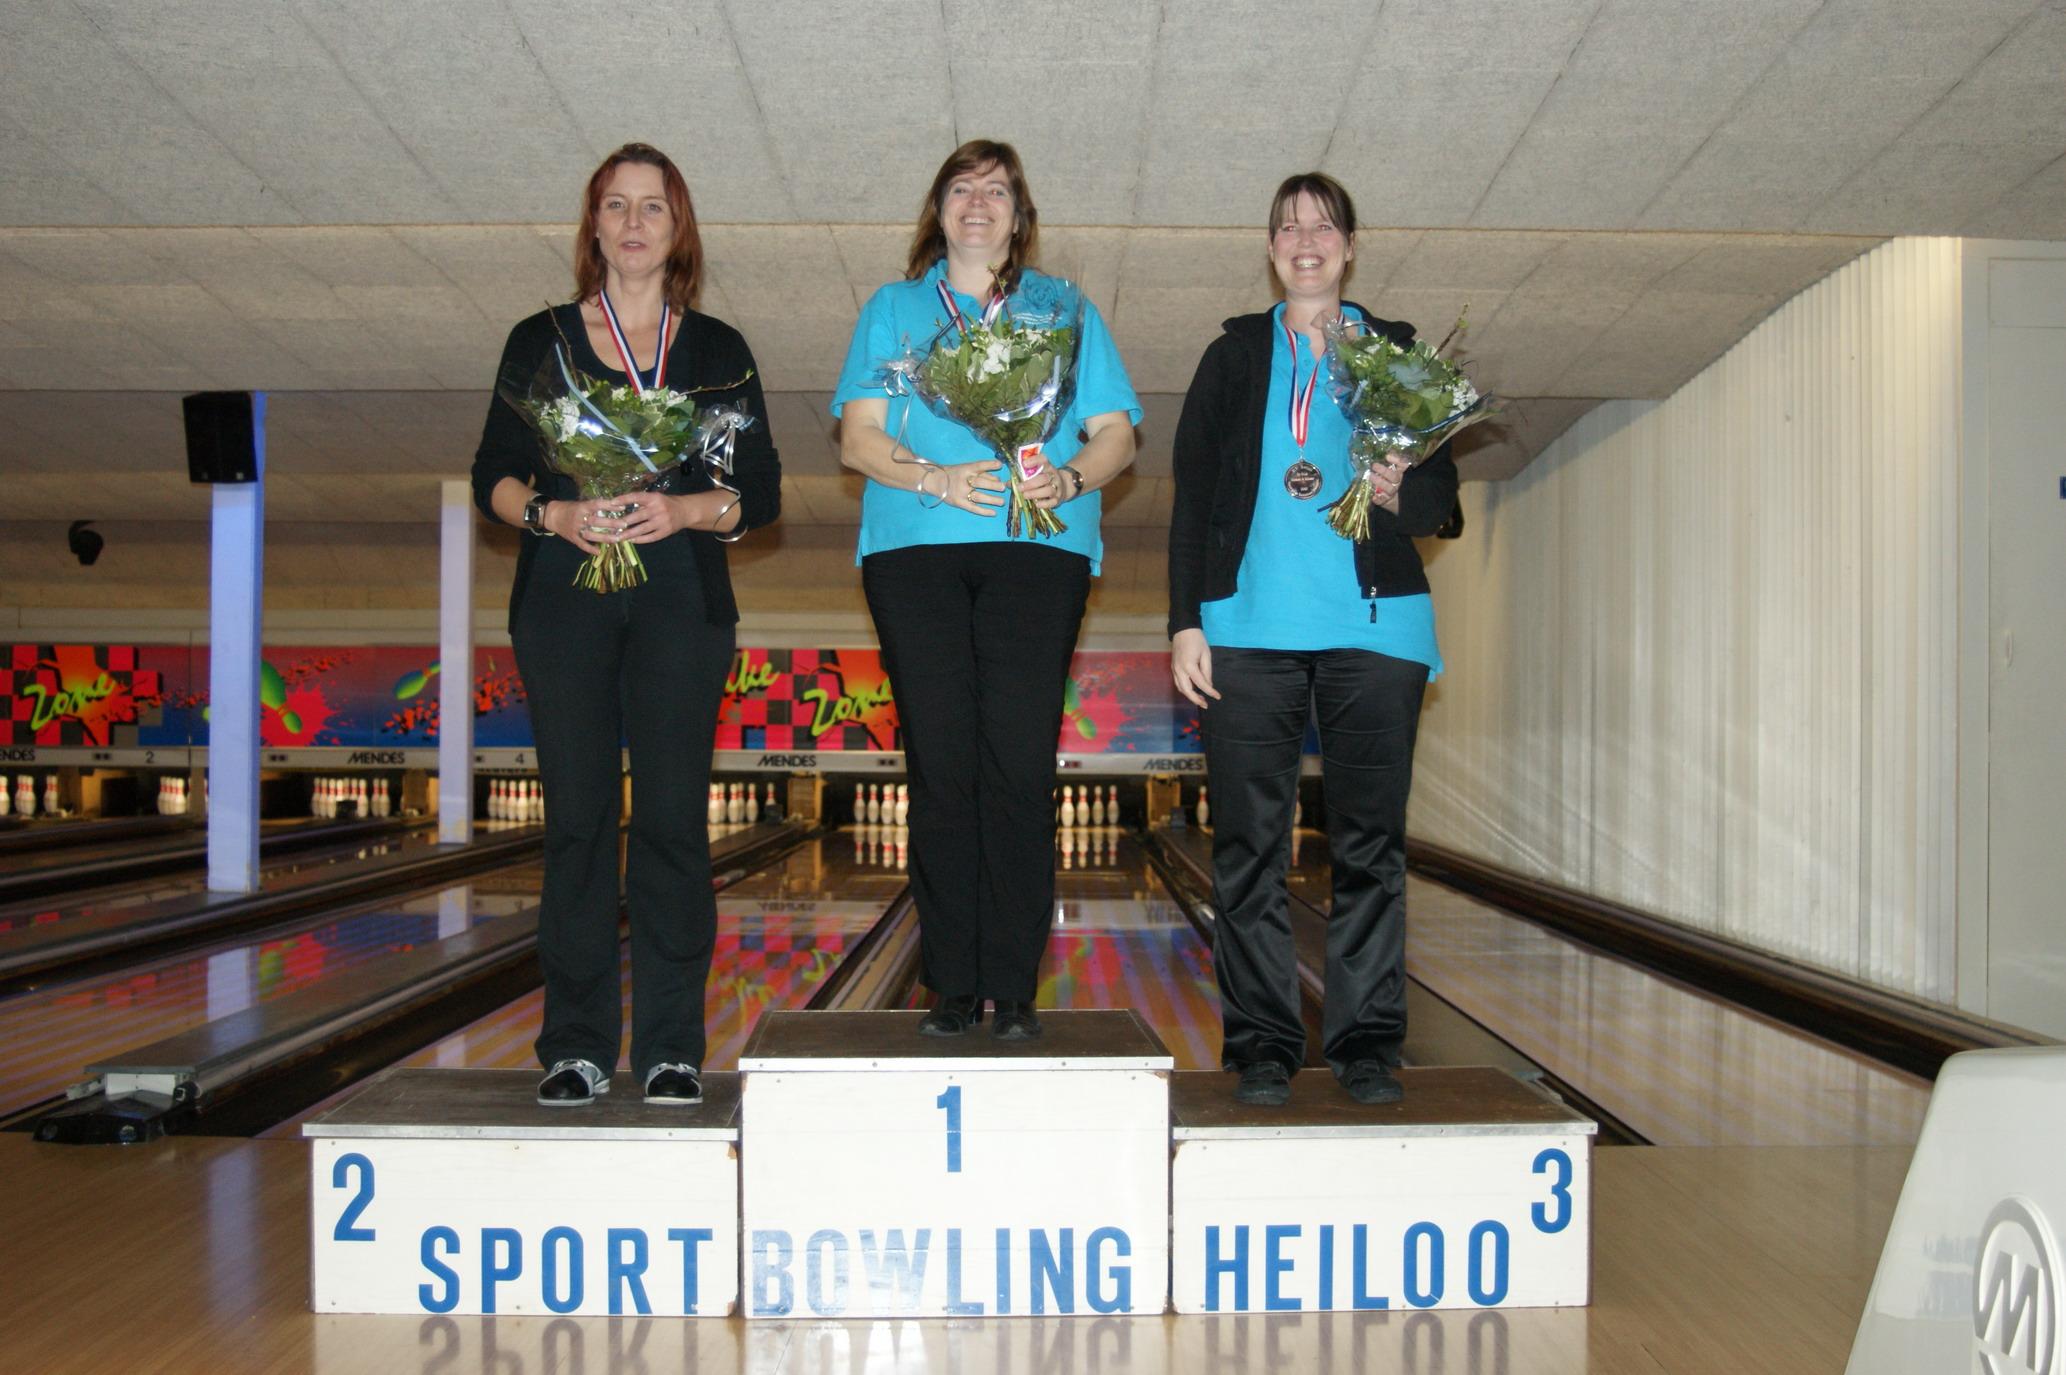 http://www.bowlingverenigingheiloo.nl/fotos_verhalen/foto's/2010_0204-Ver.kamp-Dames-AB.jpg